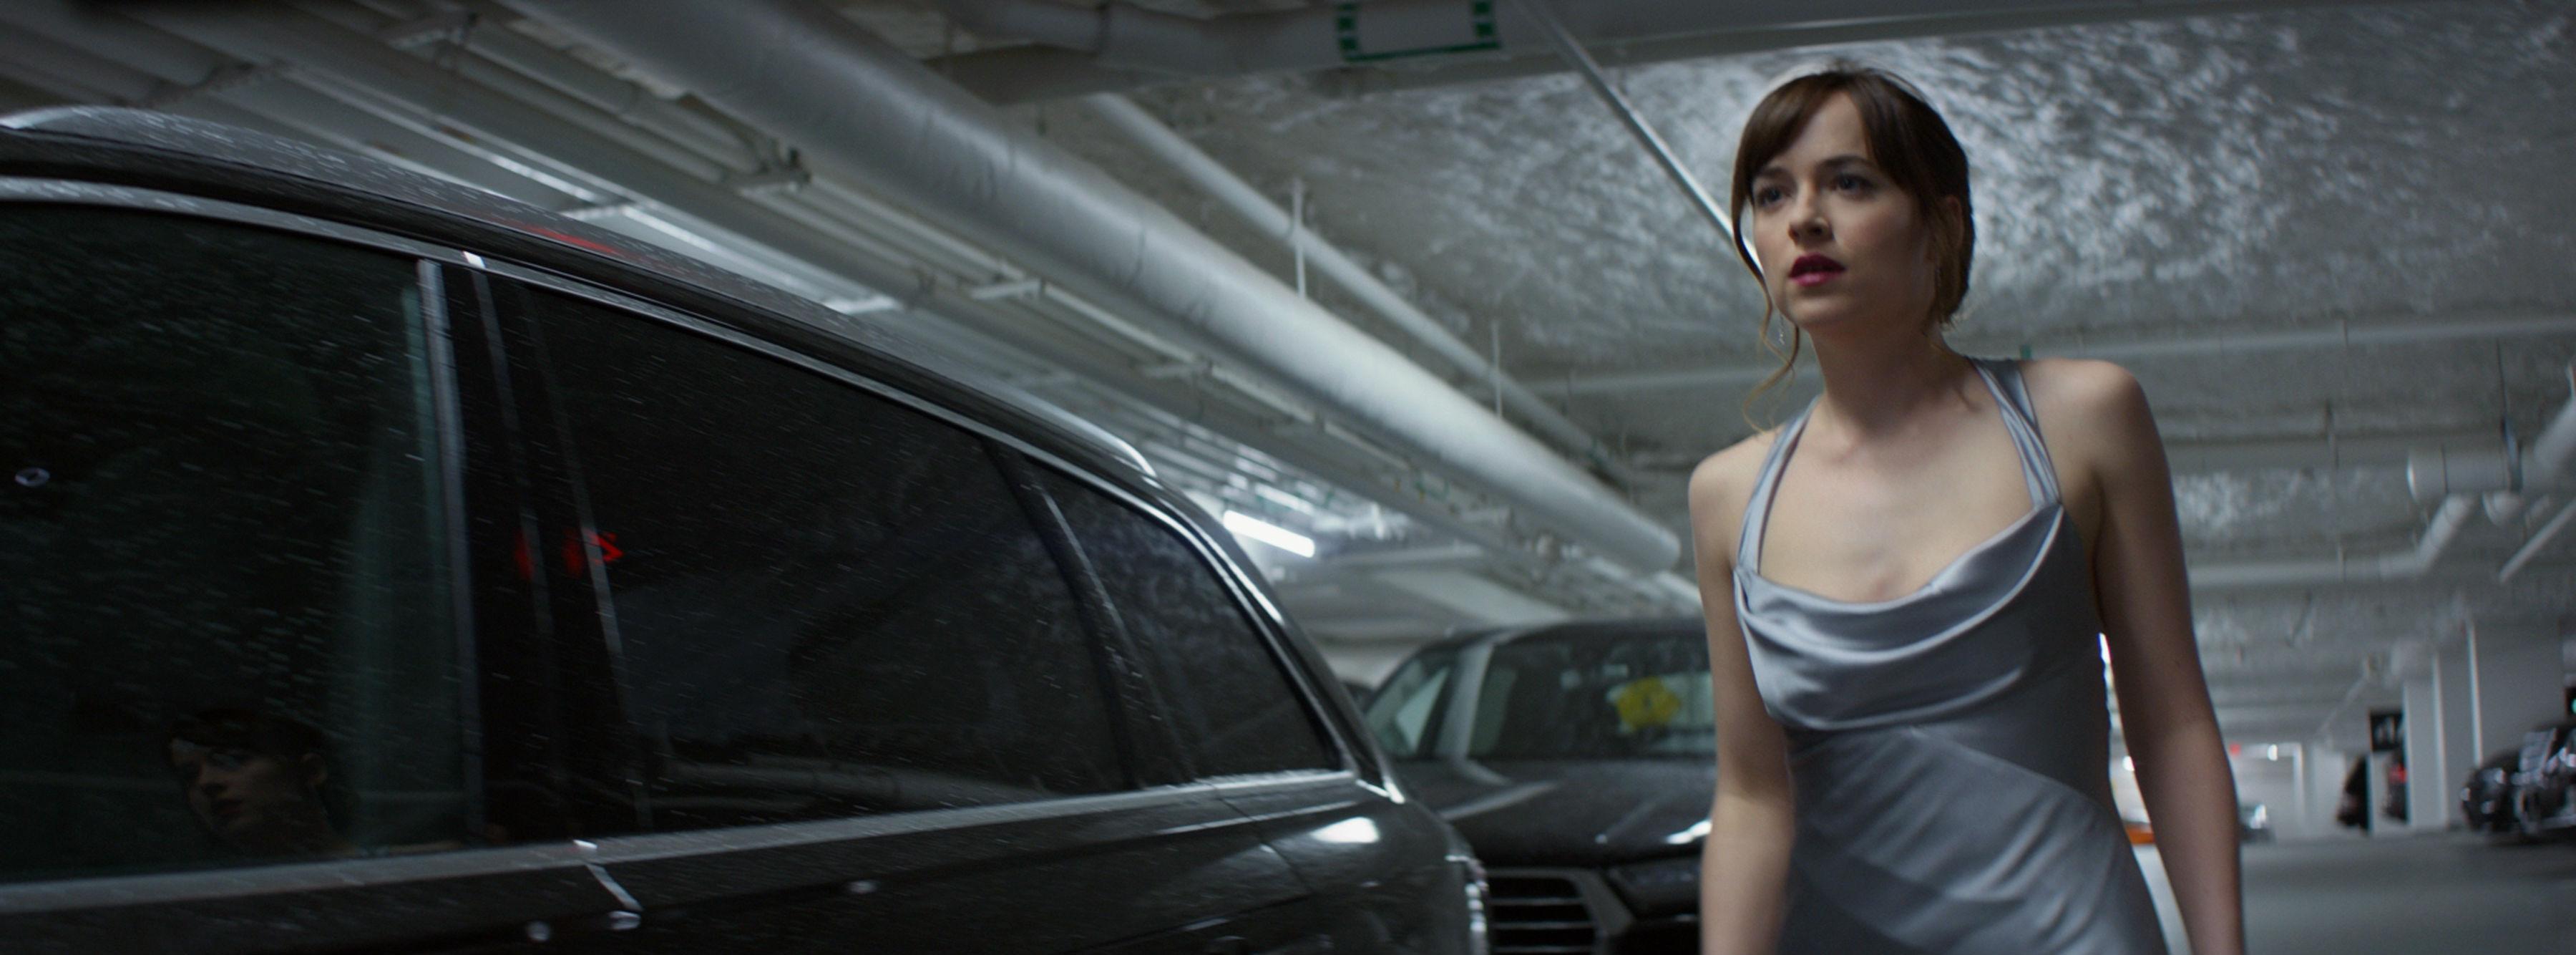 WATCH: New Fifty Shades Darker trailer released